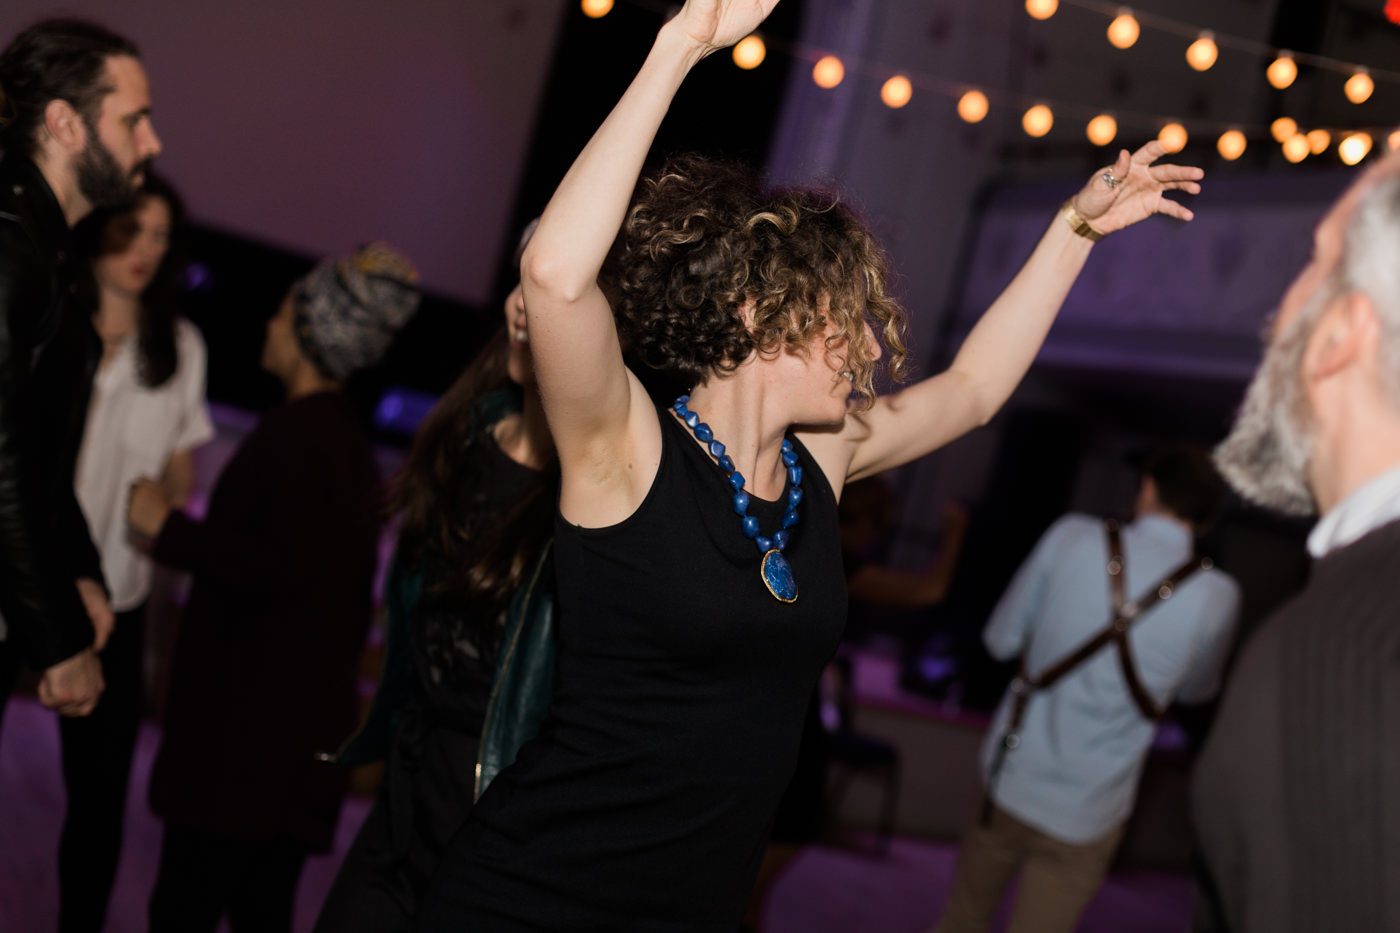 Mt Tremper Arts Gala -  NYC event photographer Kamp Weddings-37.jpg